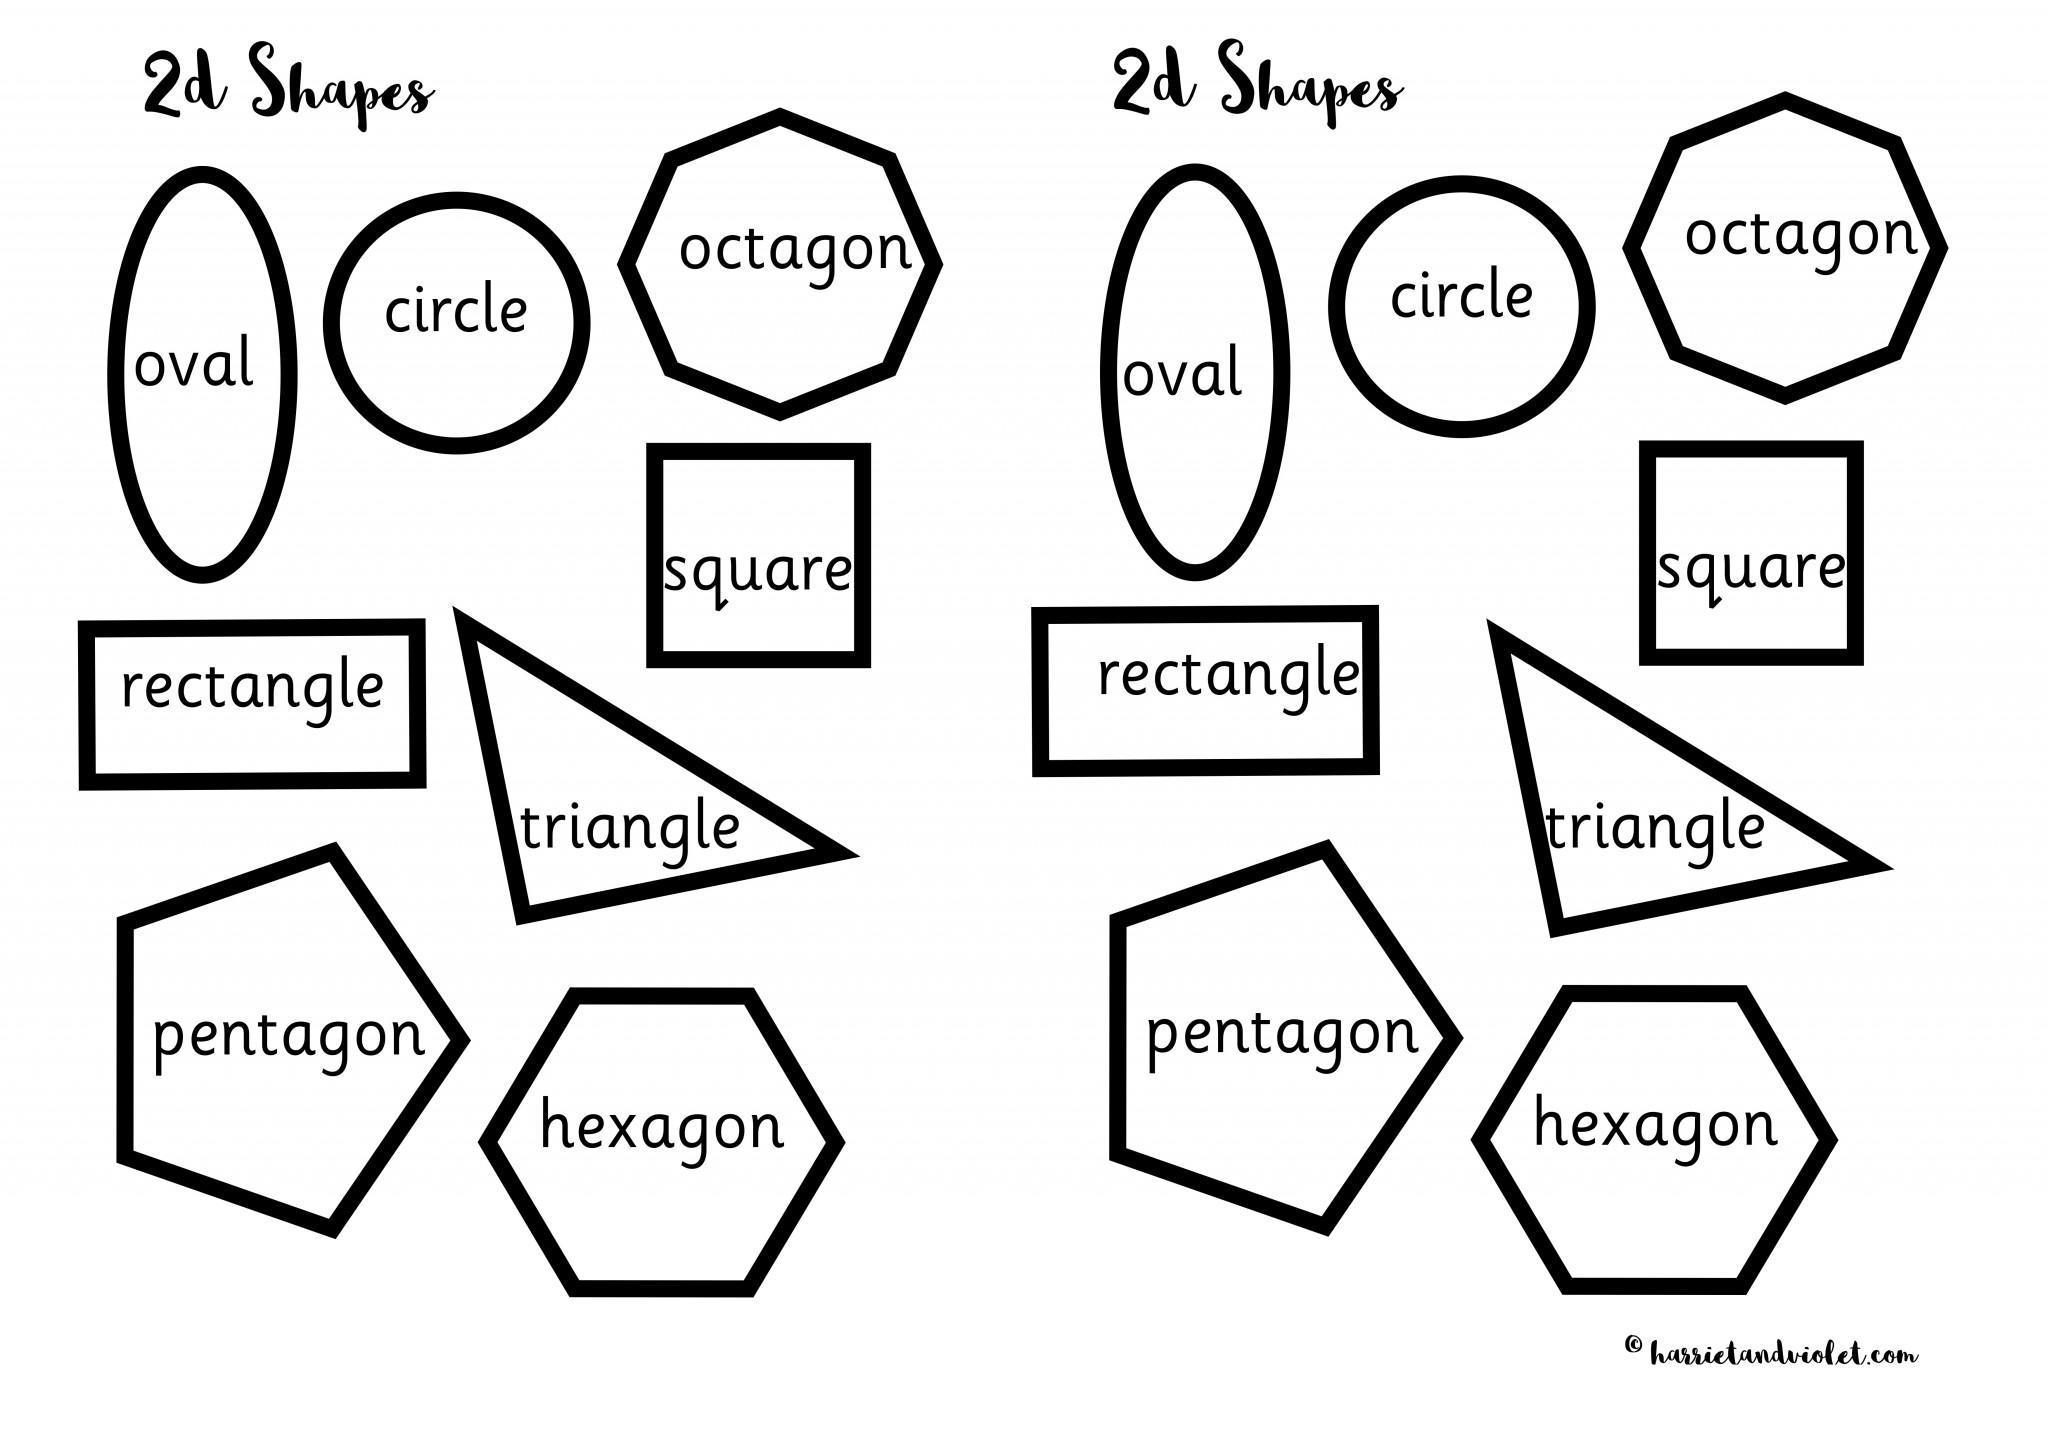 Shapes - activity for sorting, naming, matching, colouring